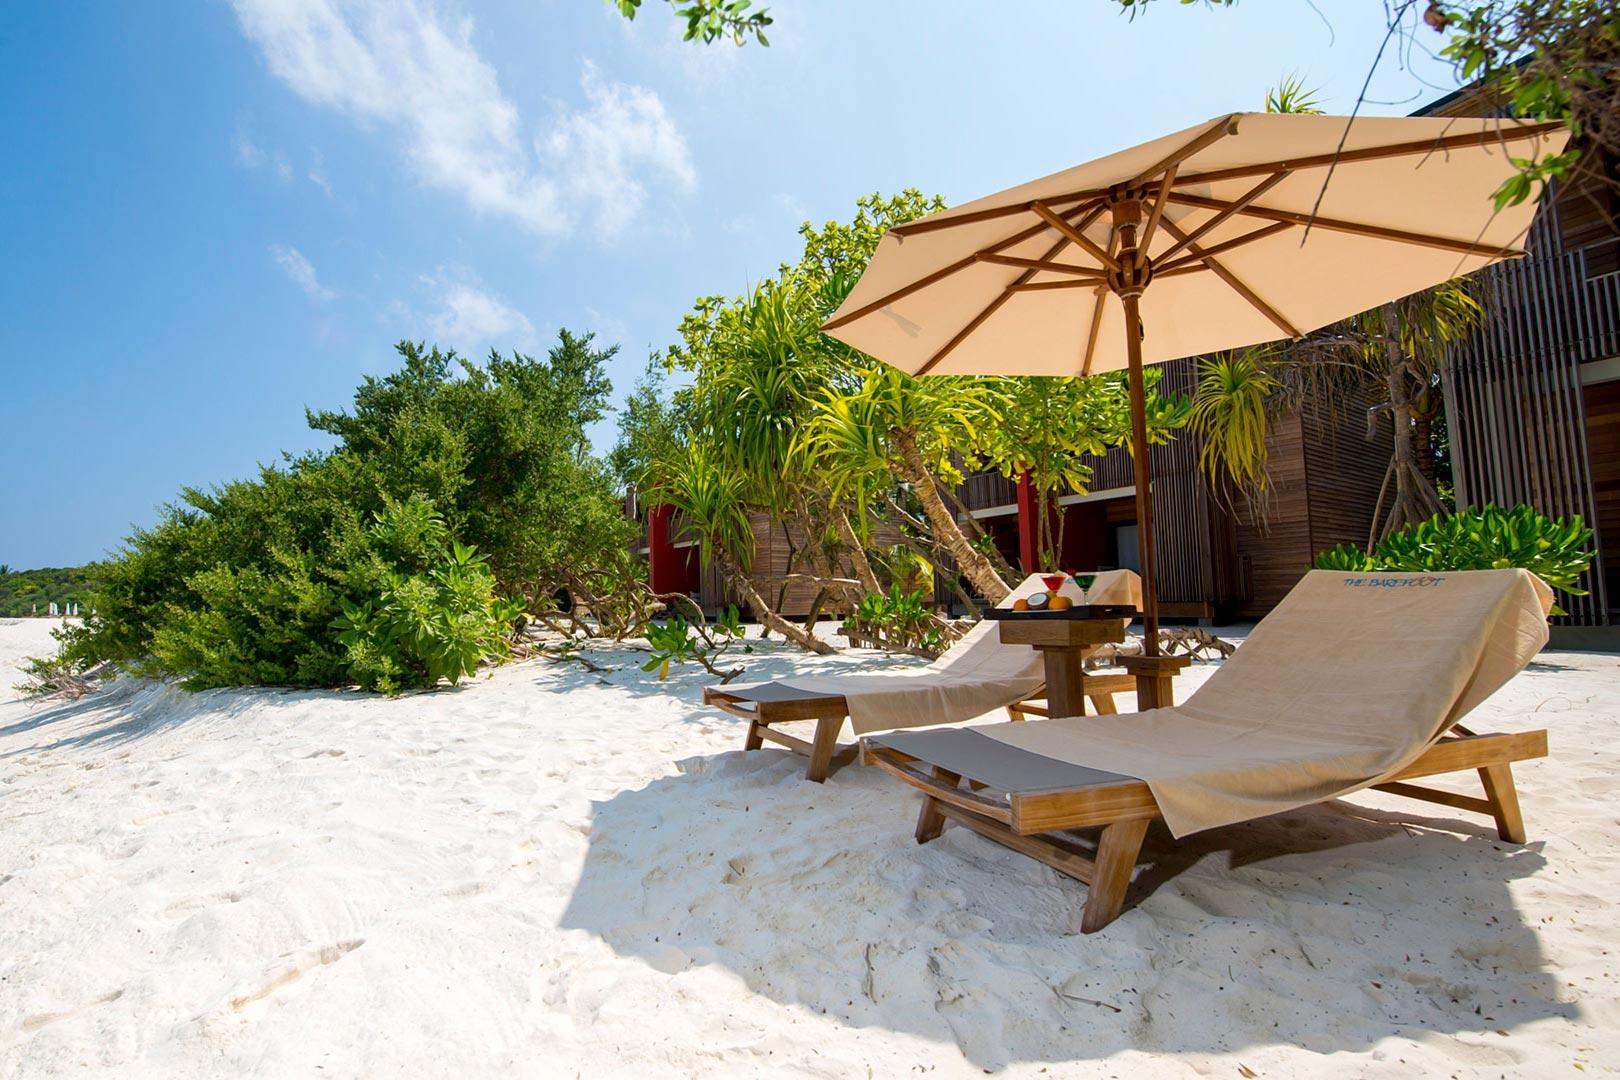 Sejur charter Maldive, 10 zile - 9 ianuarie 2022